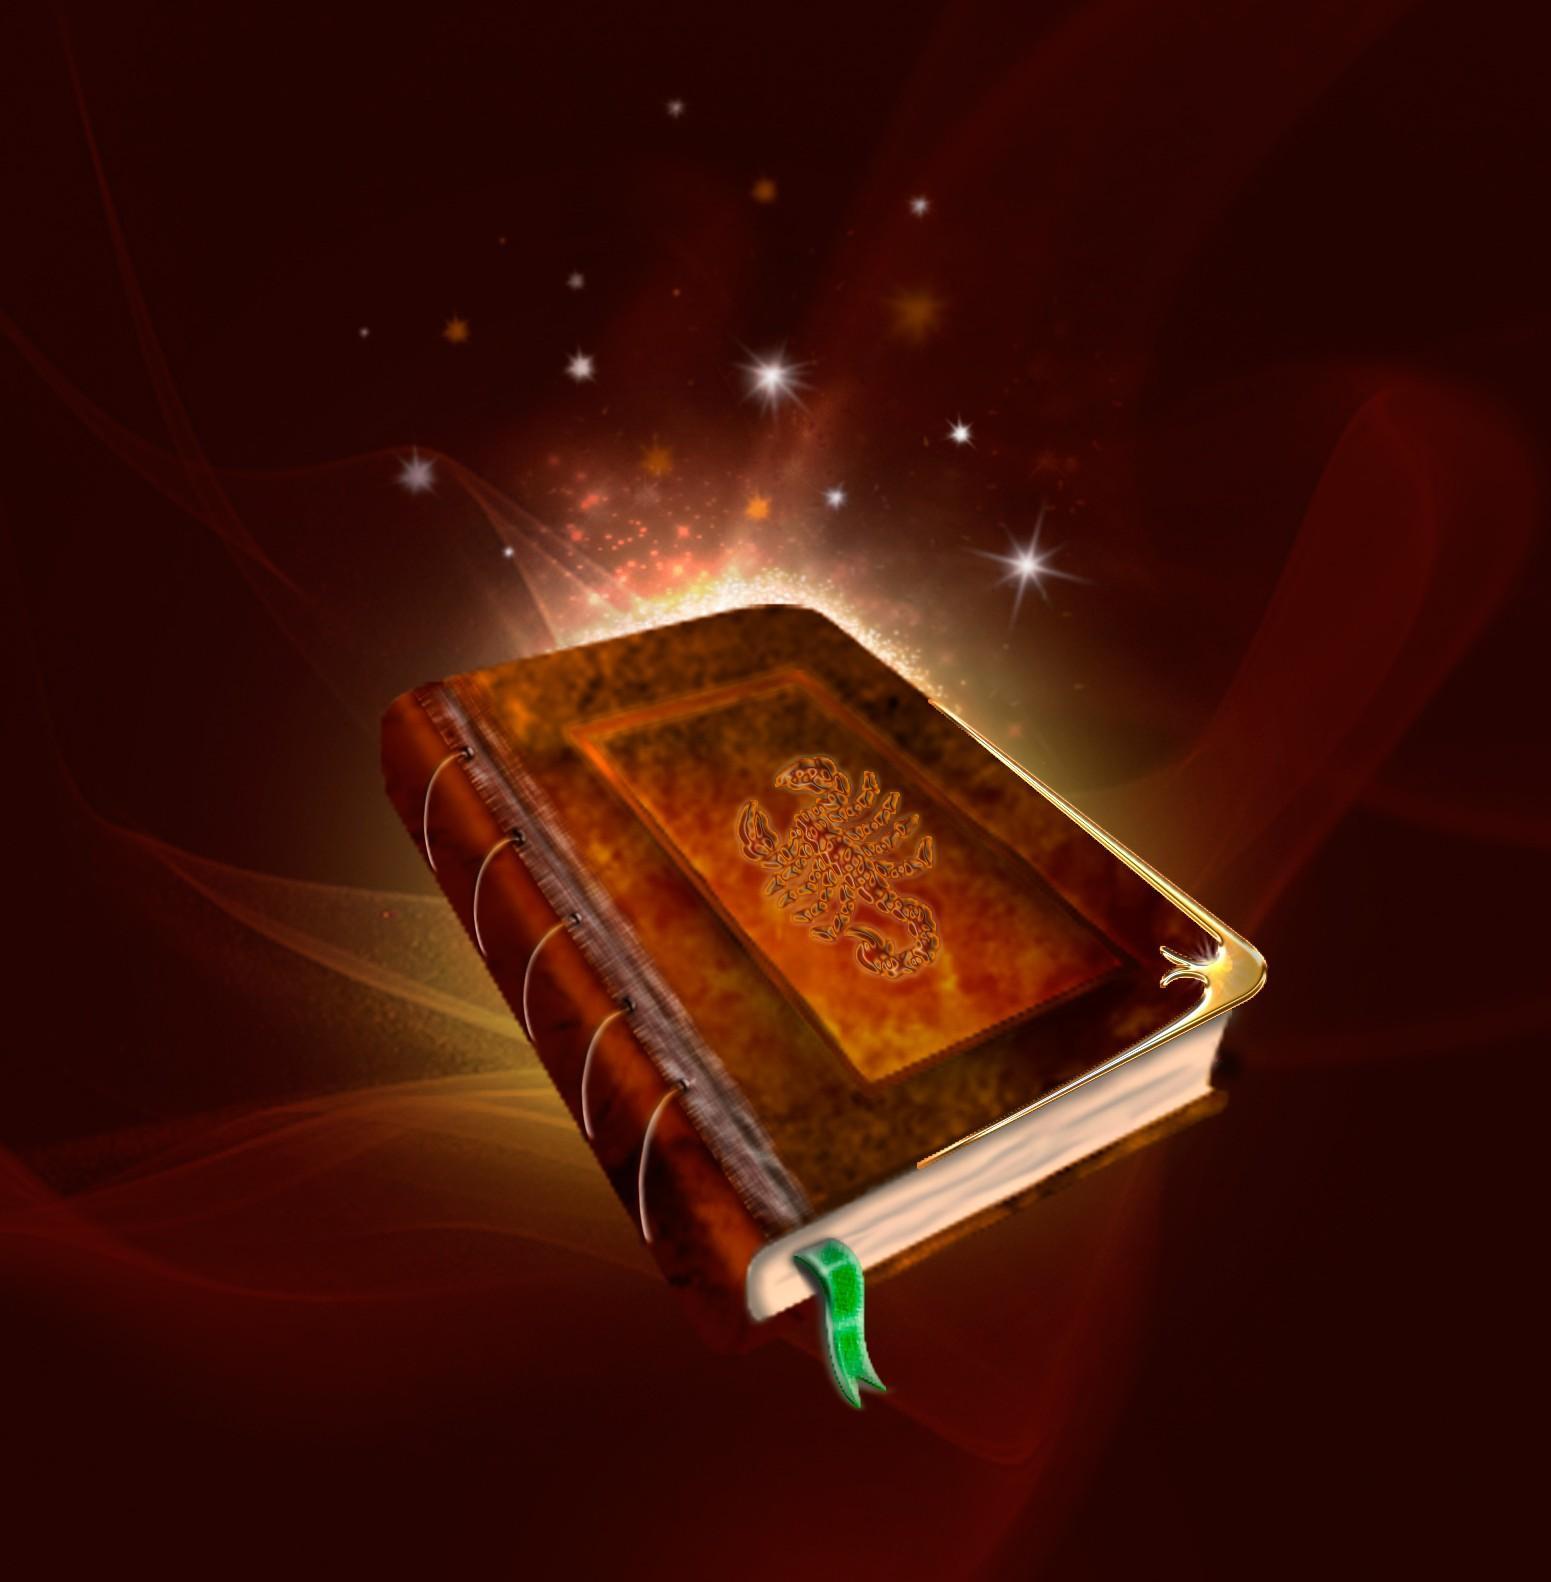 1204250 64458665 e1396648139923 - Esoterika. Ezoterika, Co je to esoterika, tajemství esoteriky, démoni a draci.